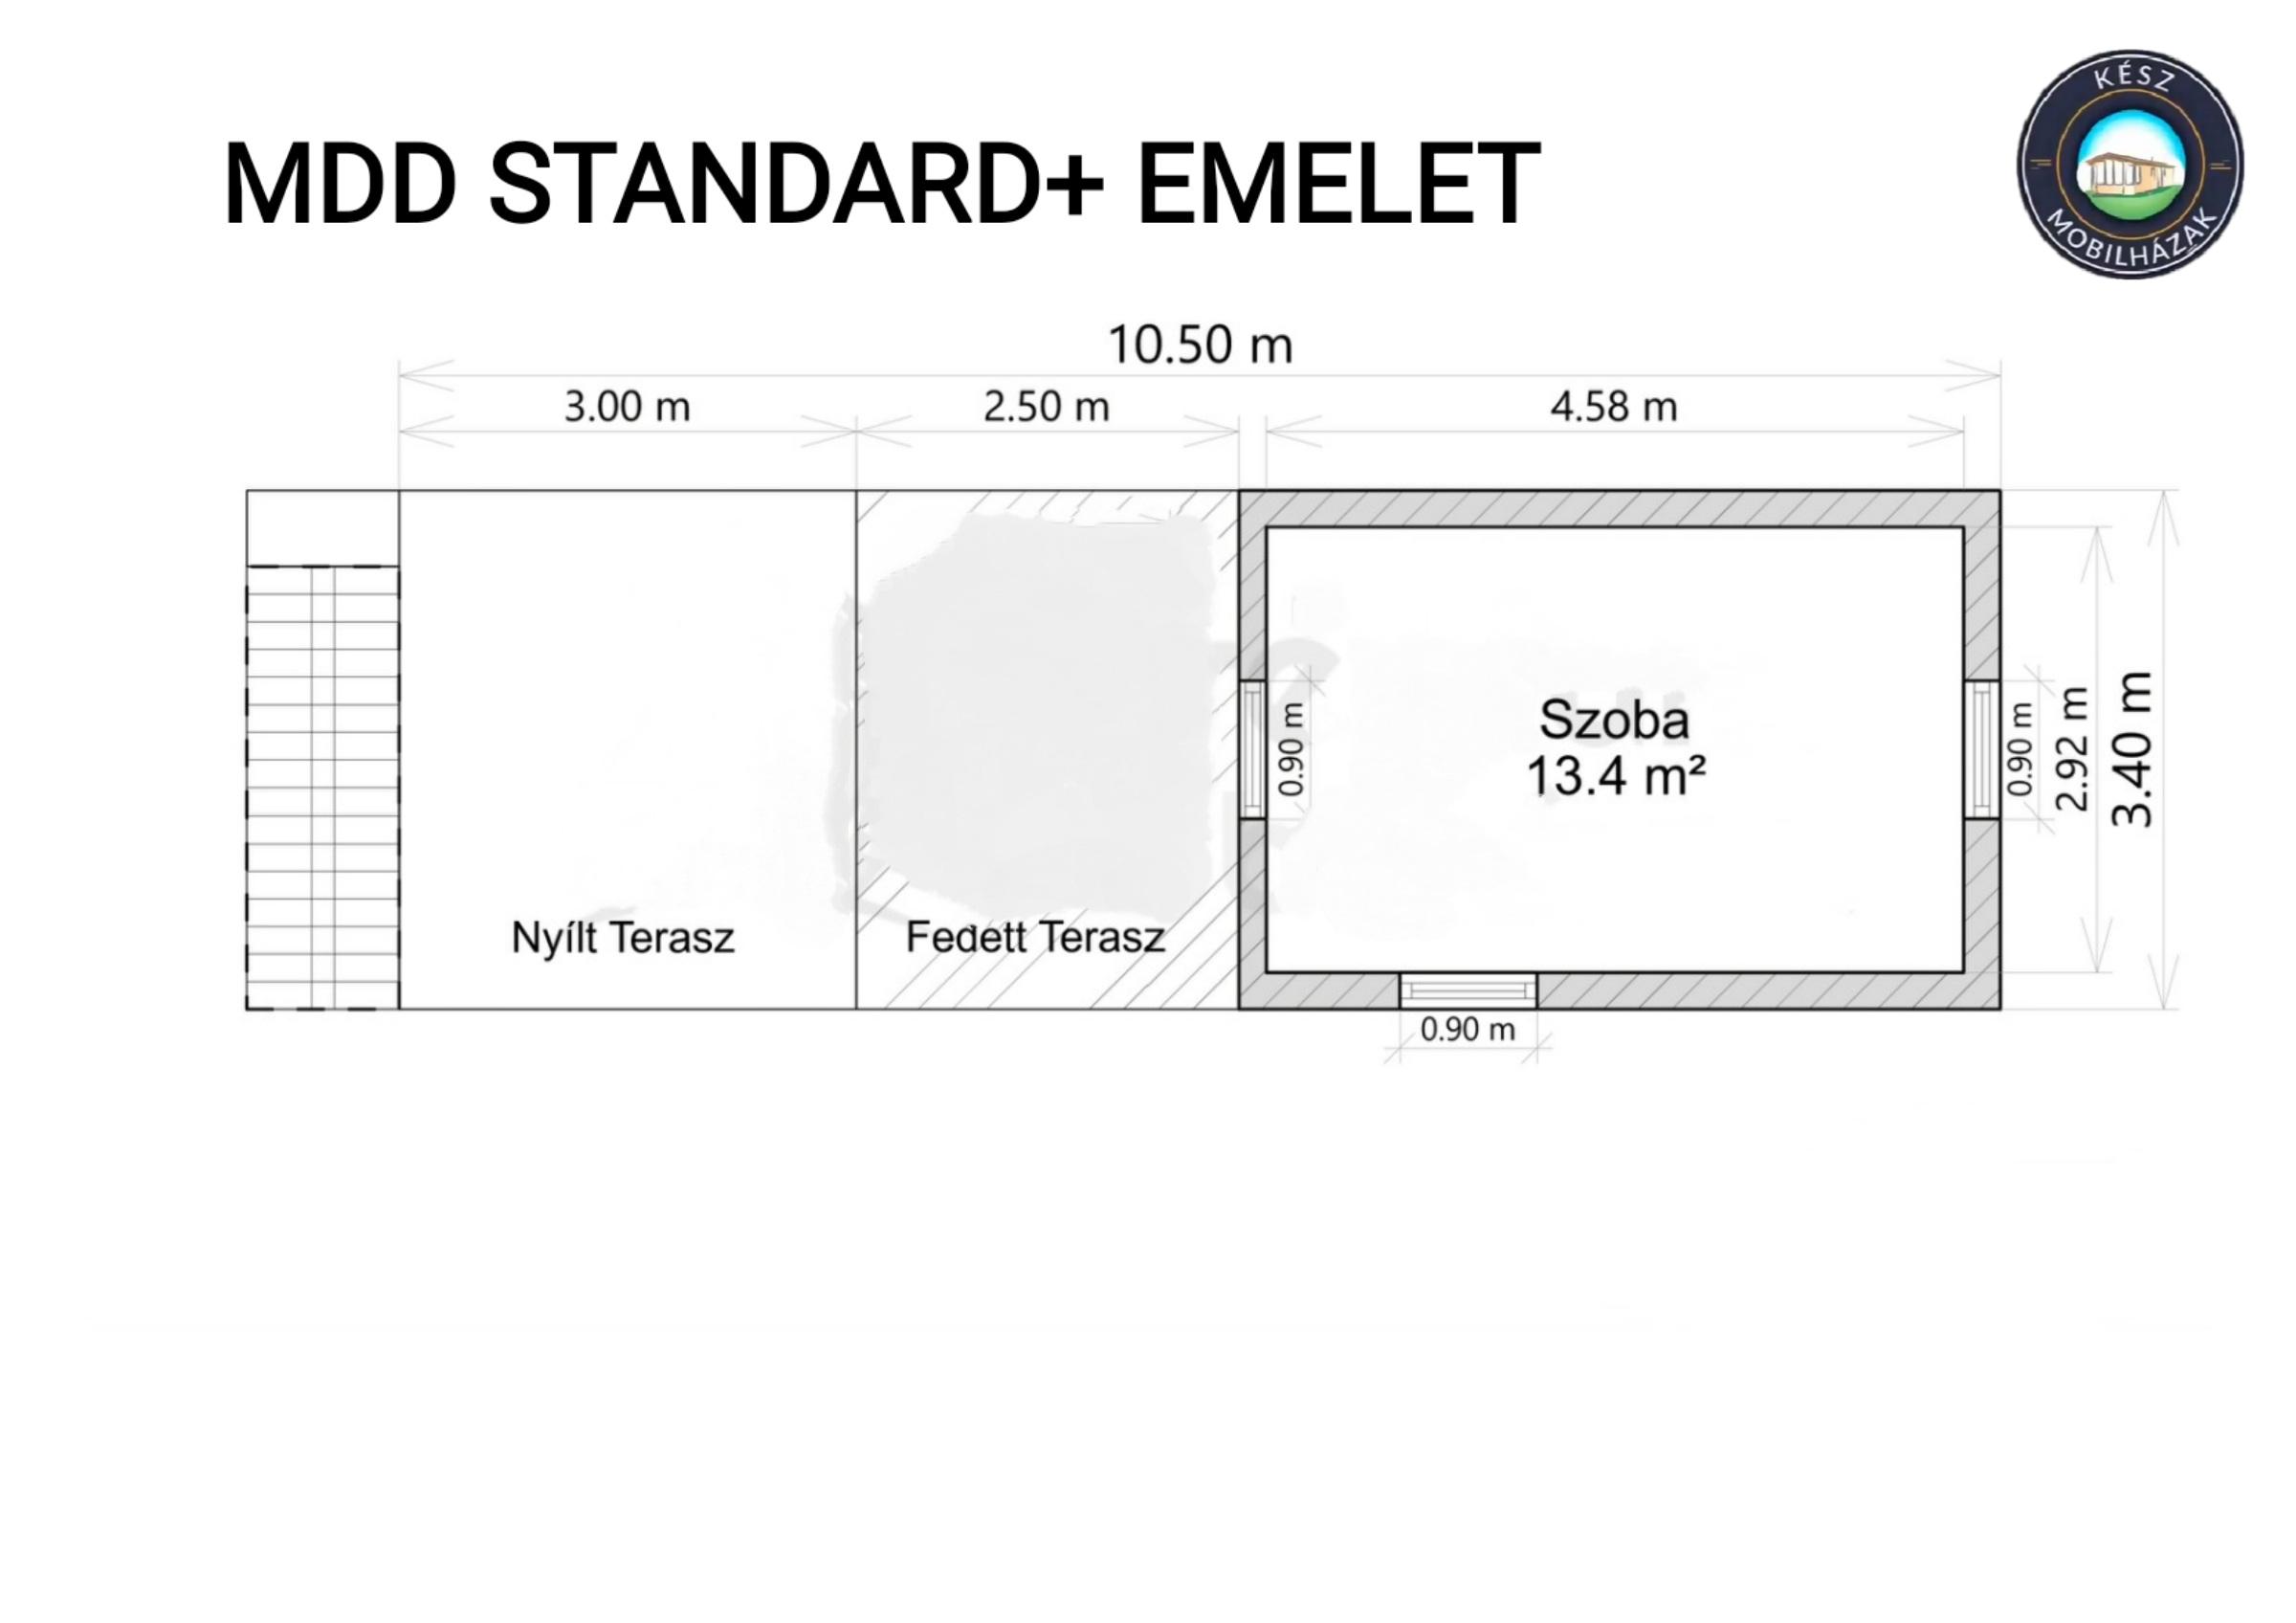 MDD50 STANDARD+ EMELET